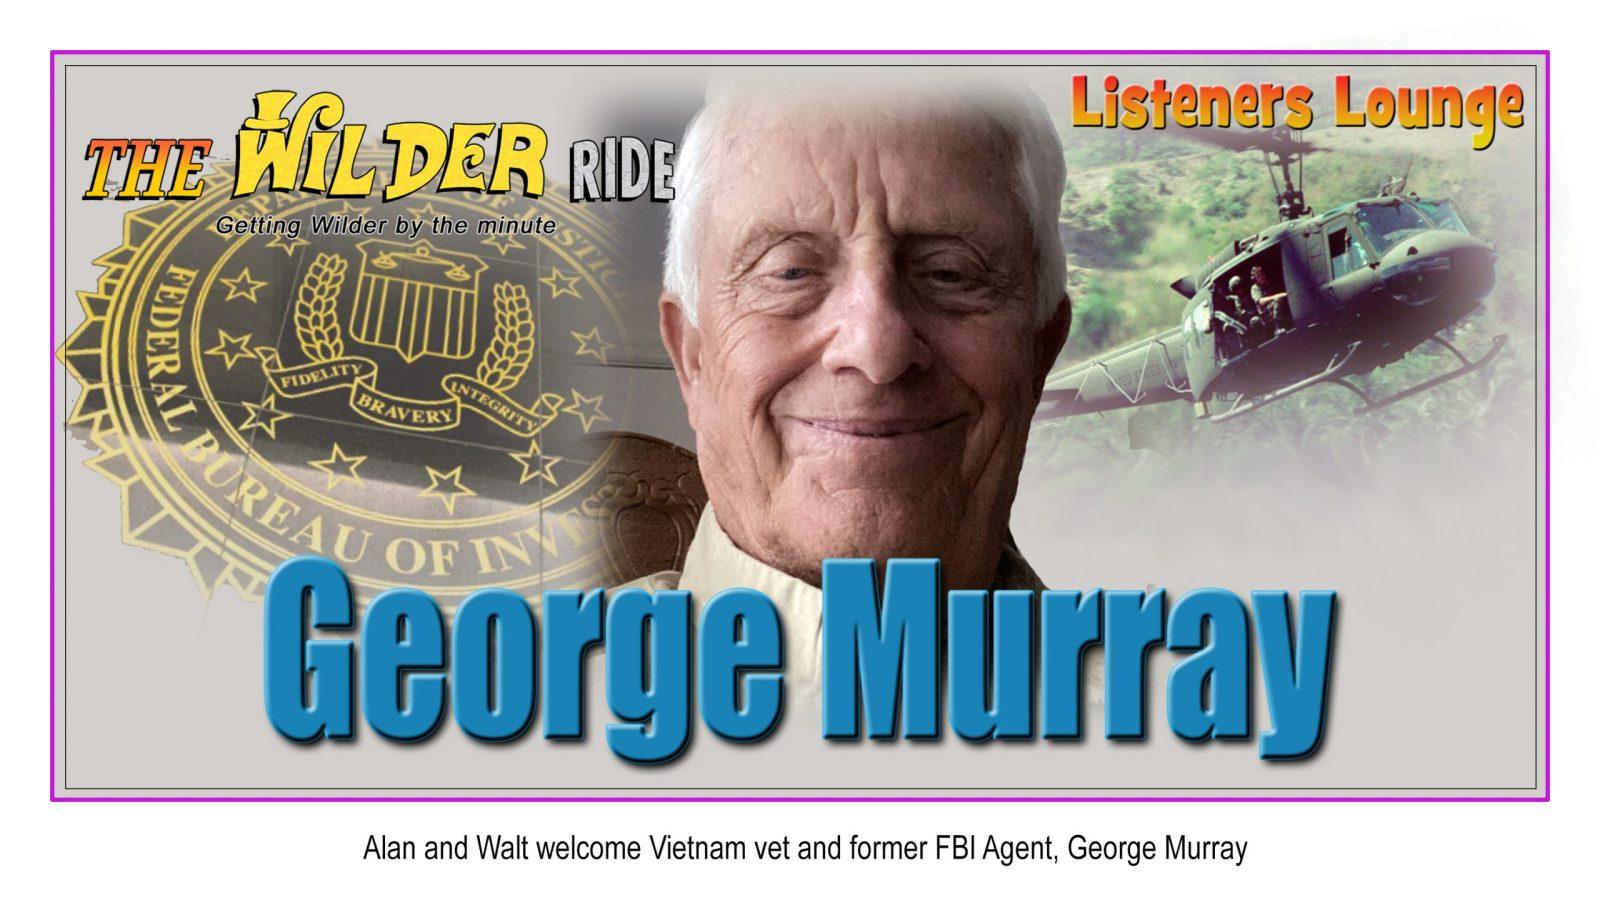 George Murray